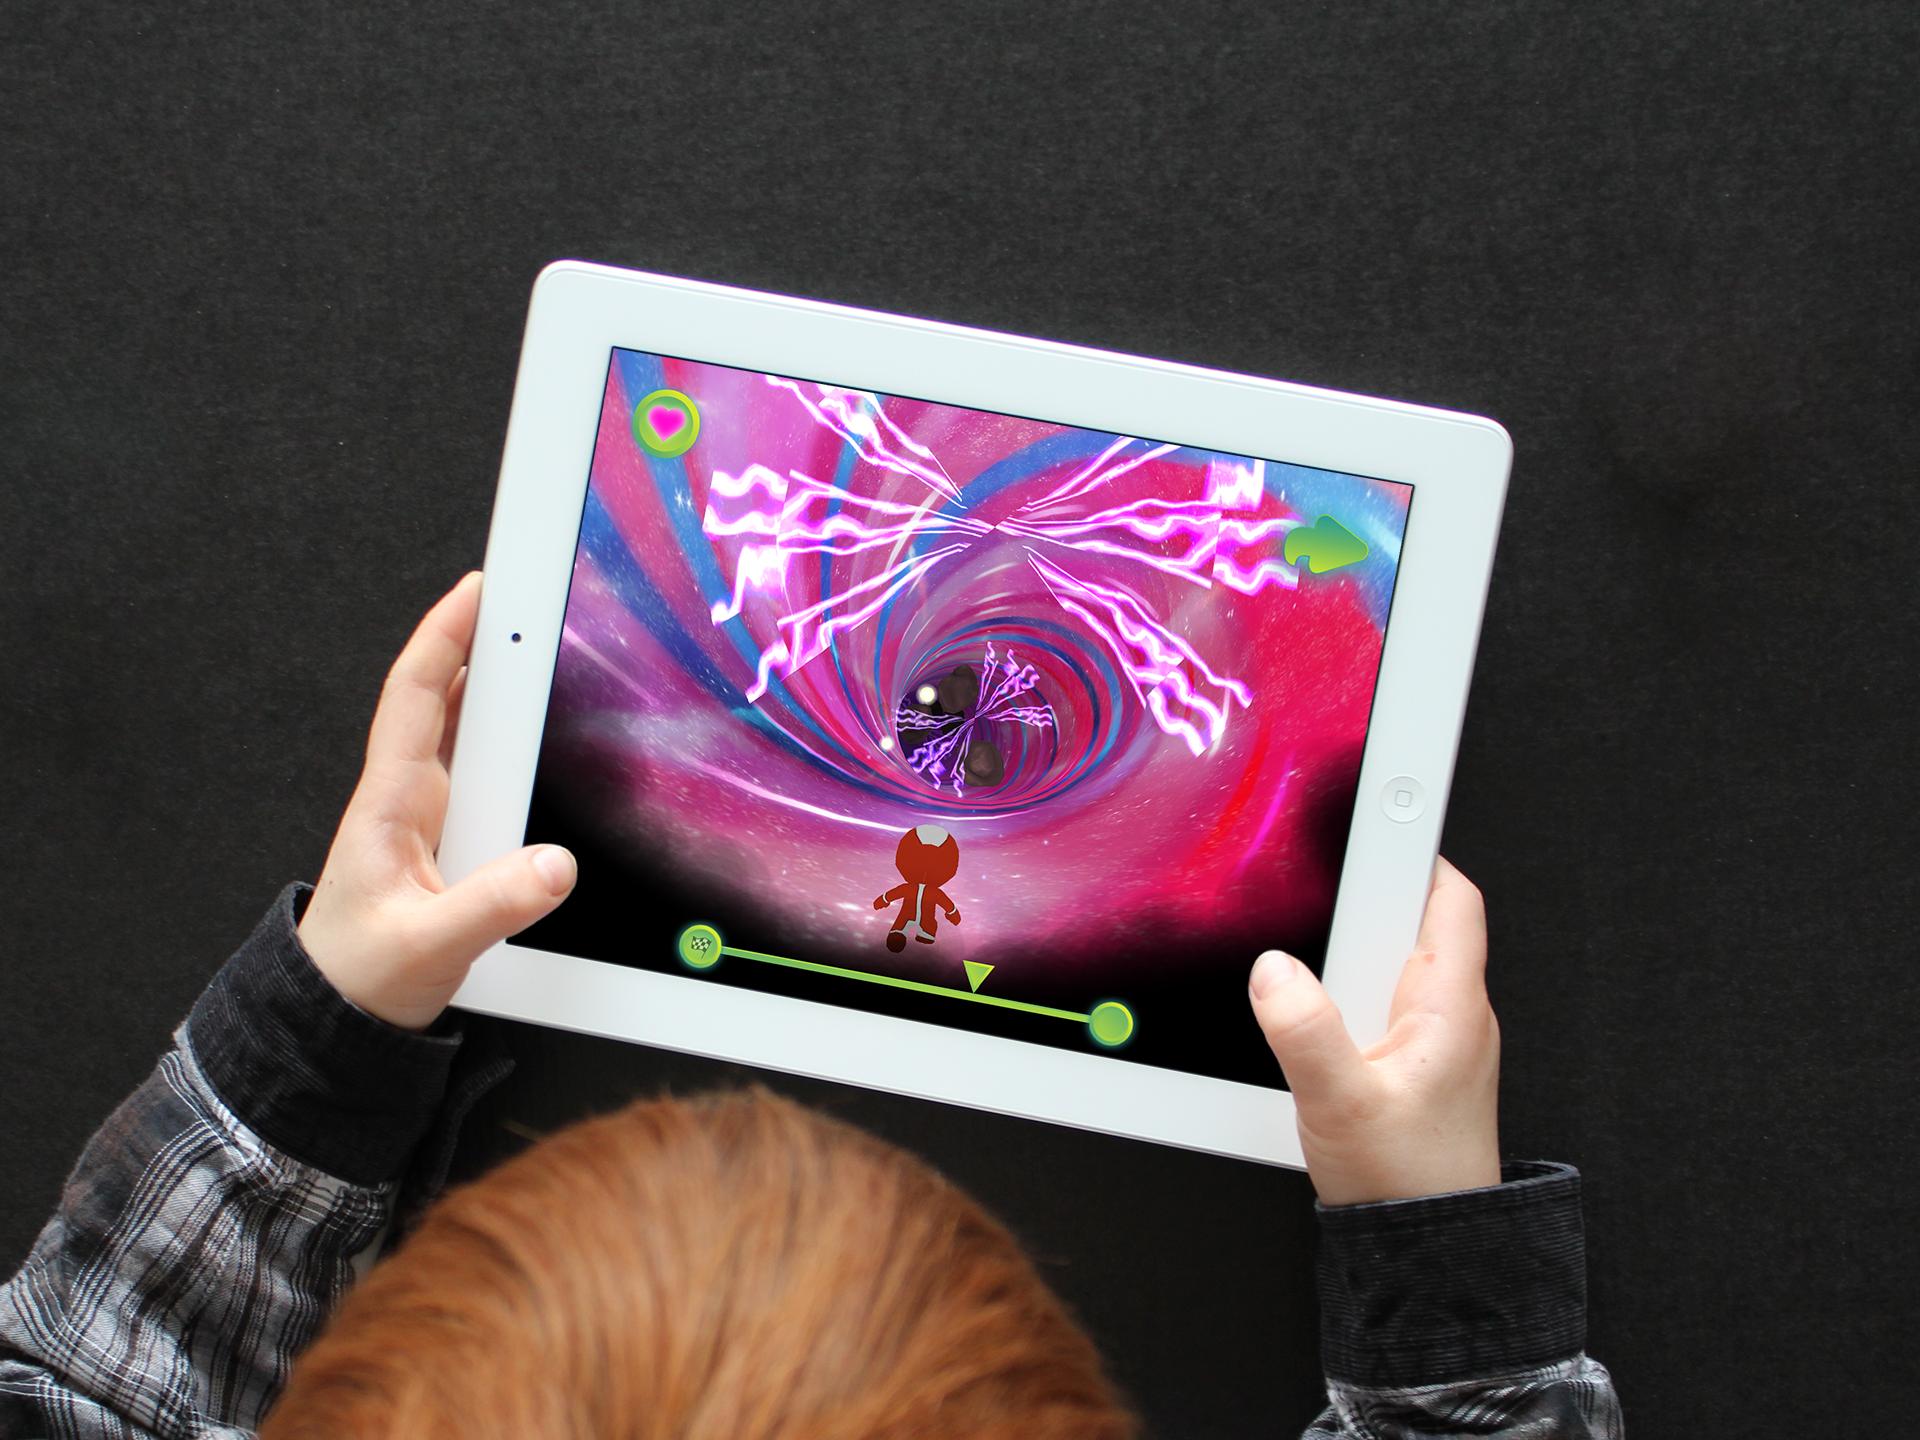 Clarks Gloforms App mobile game